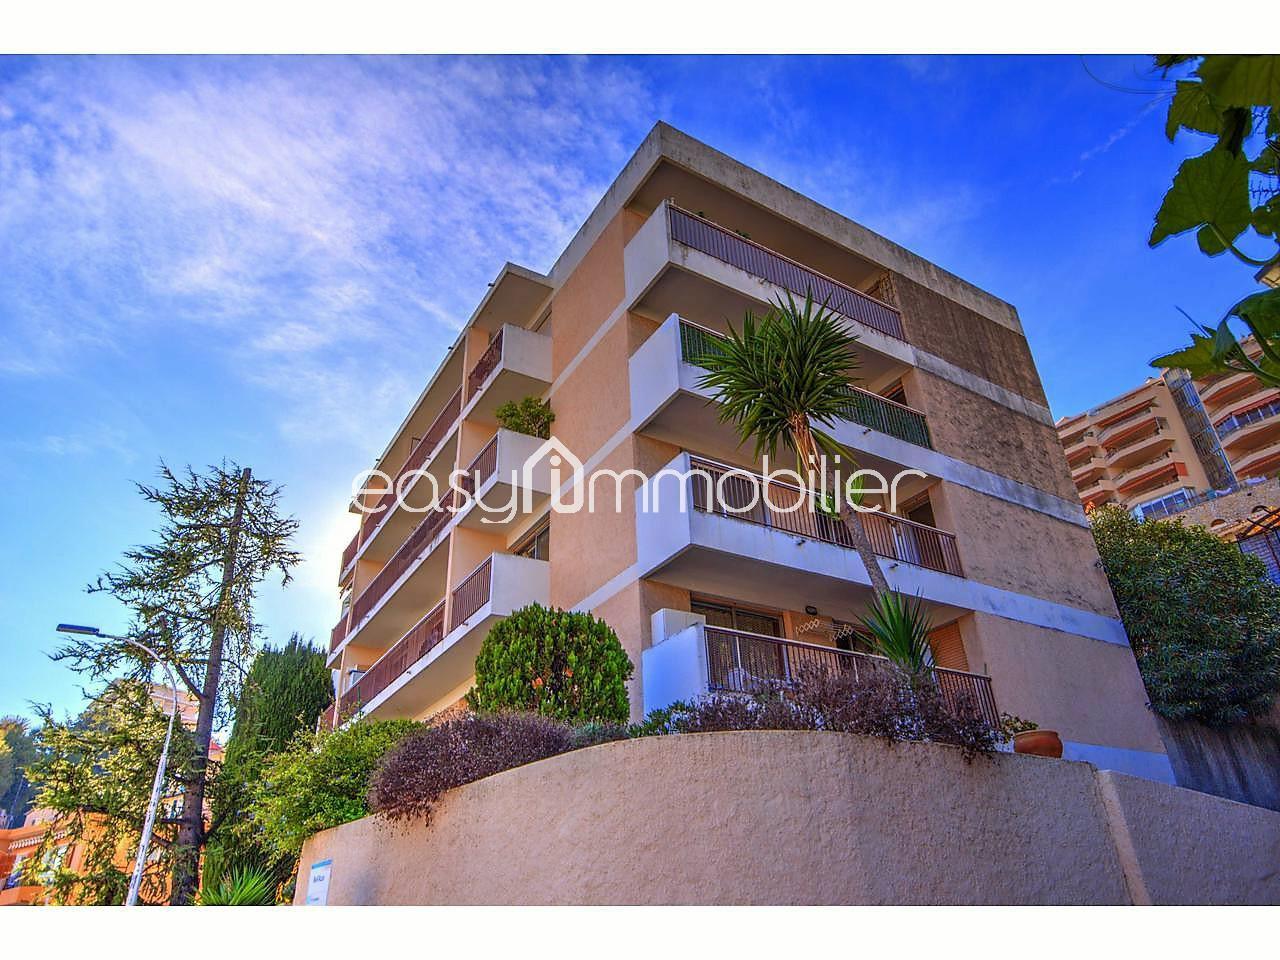 Location Appartement Nice - 2 pièces - 50 m²